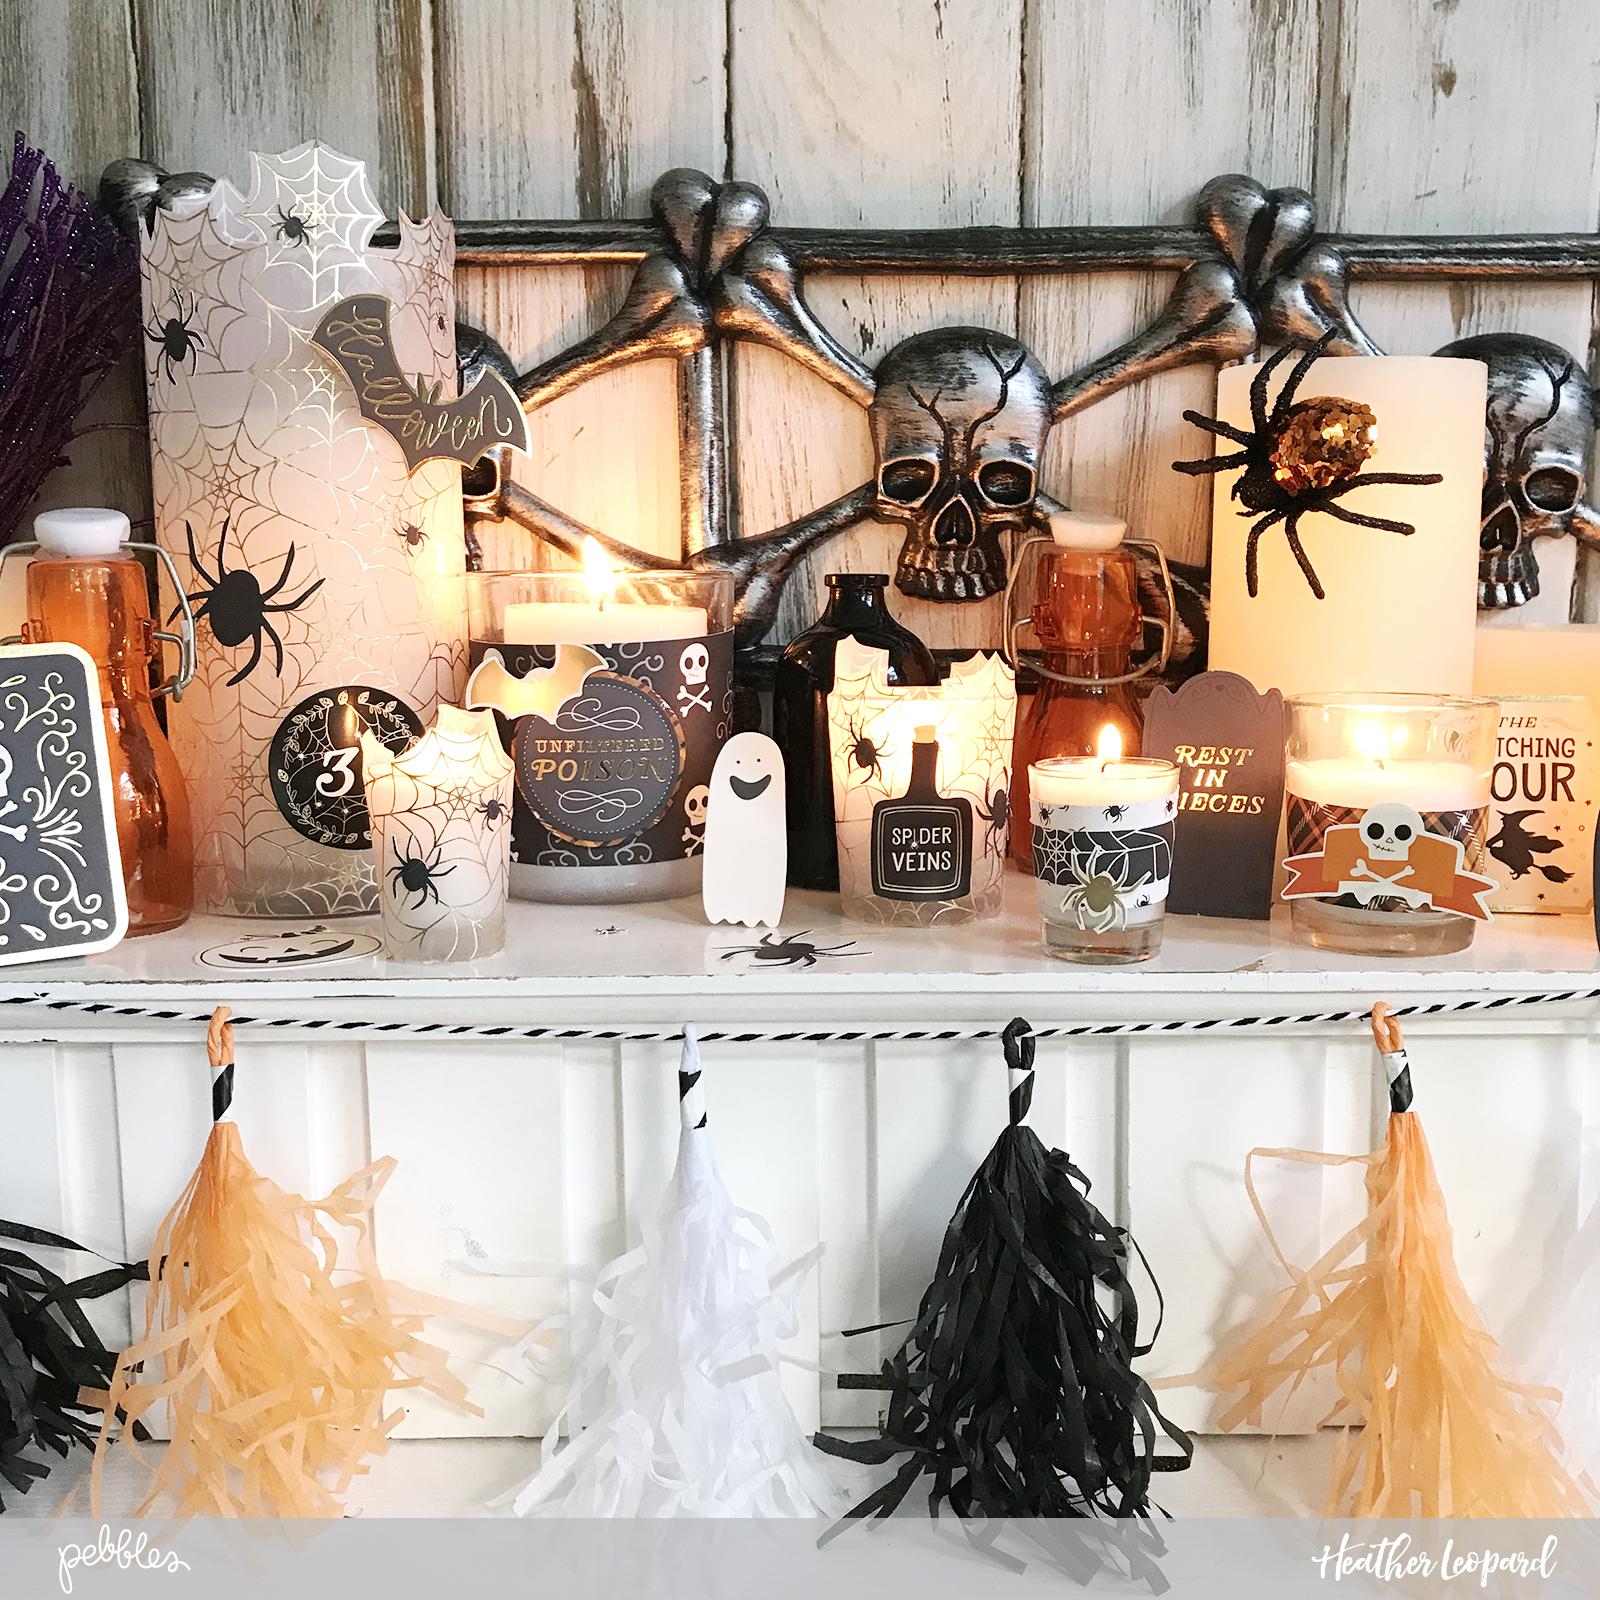 DIY Candle Decor by @heatherleopard using @pebblesinc #MidnightHaunting #DIY #Halloween #madewithpebbles #heatherleopard #halloweendecor